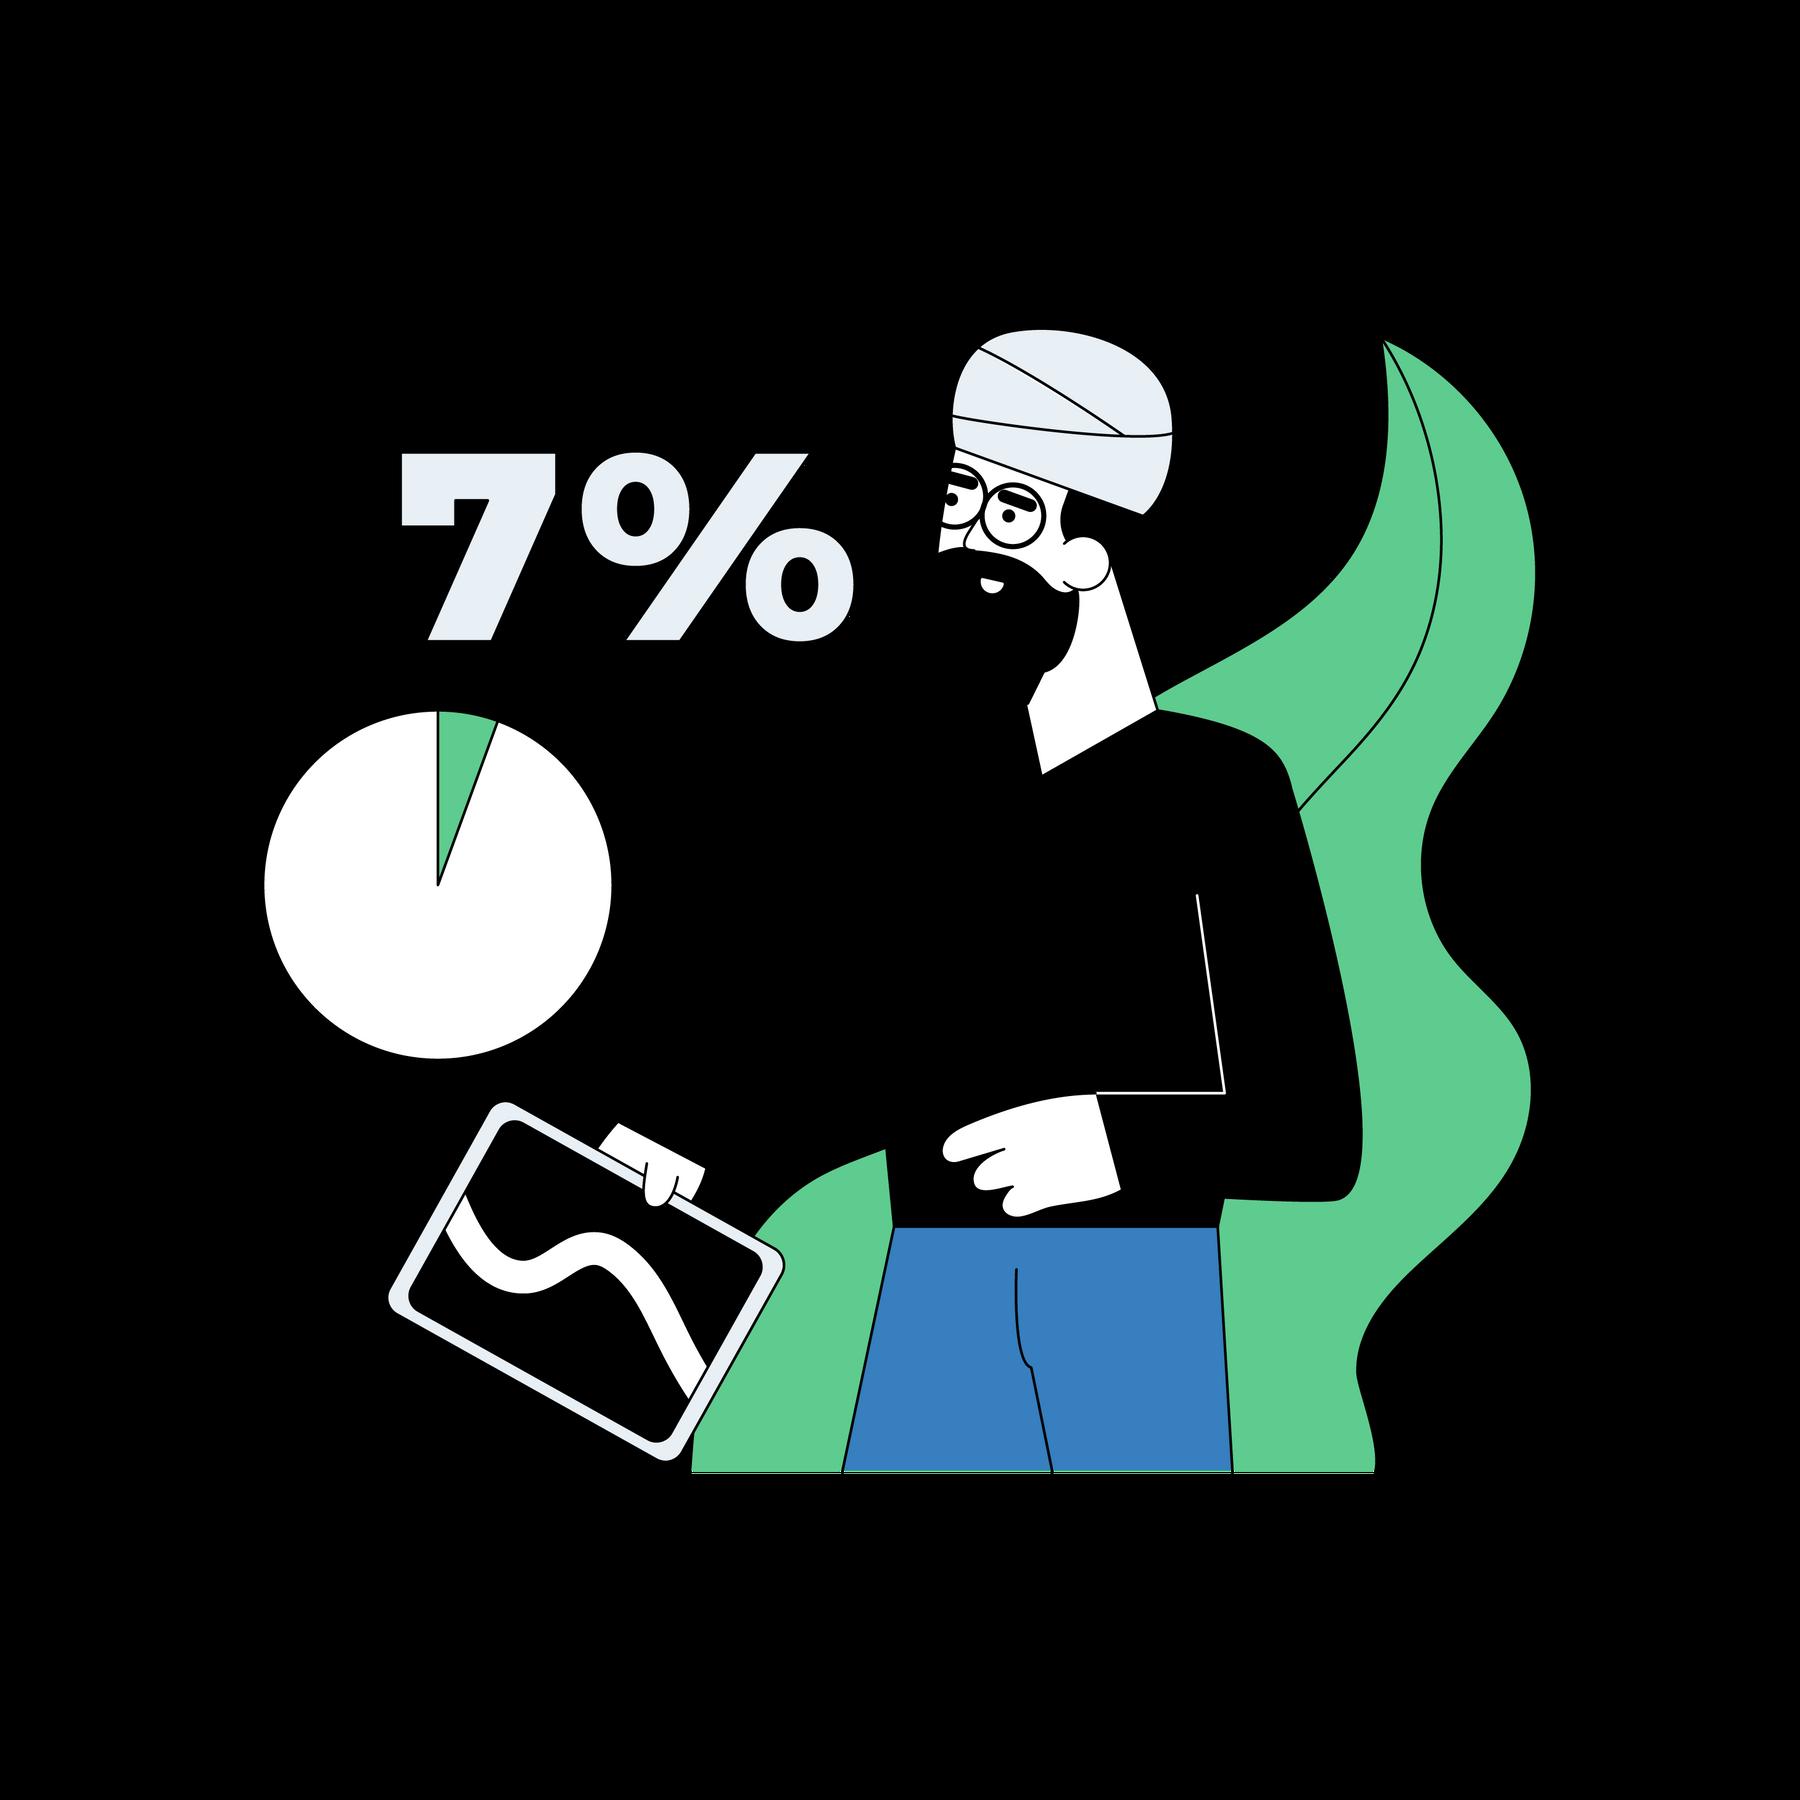 Illustration of man holding a tablet.